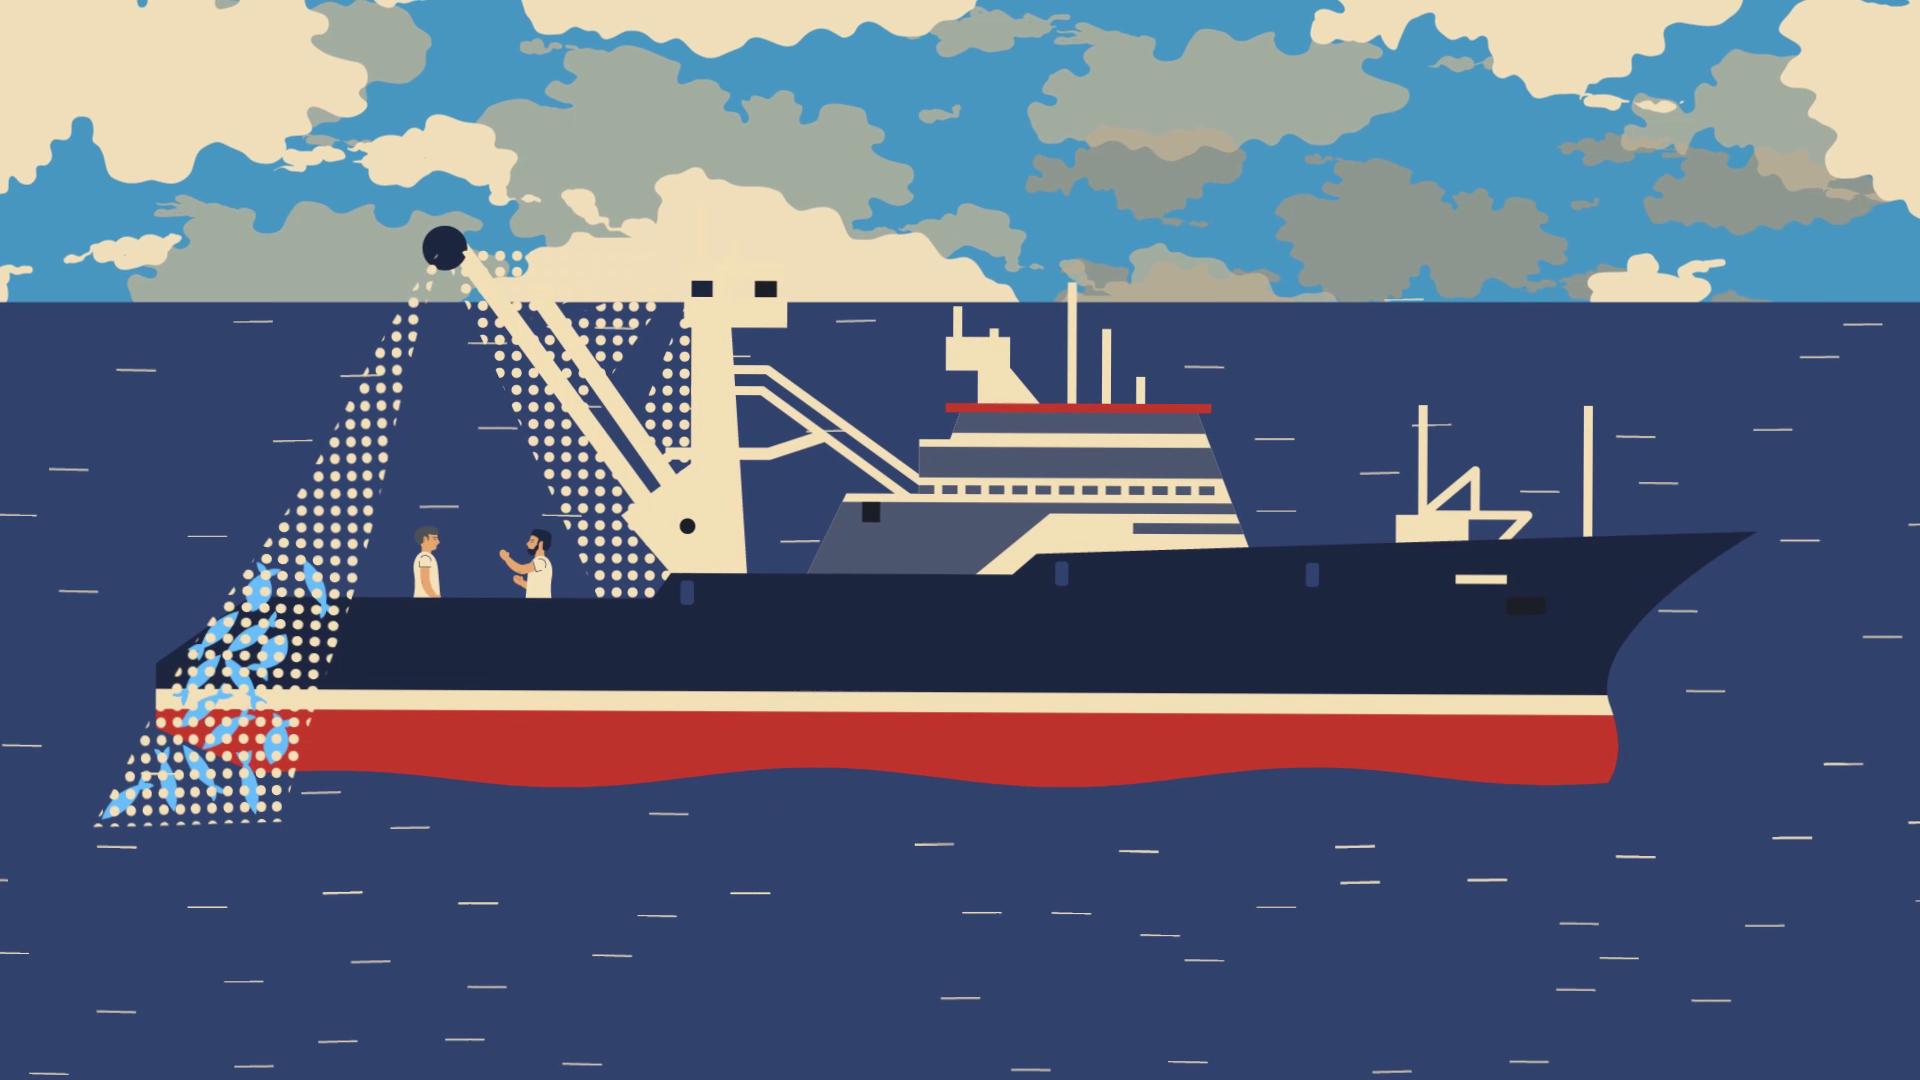 Ship - Animation